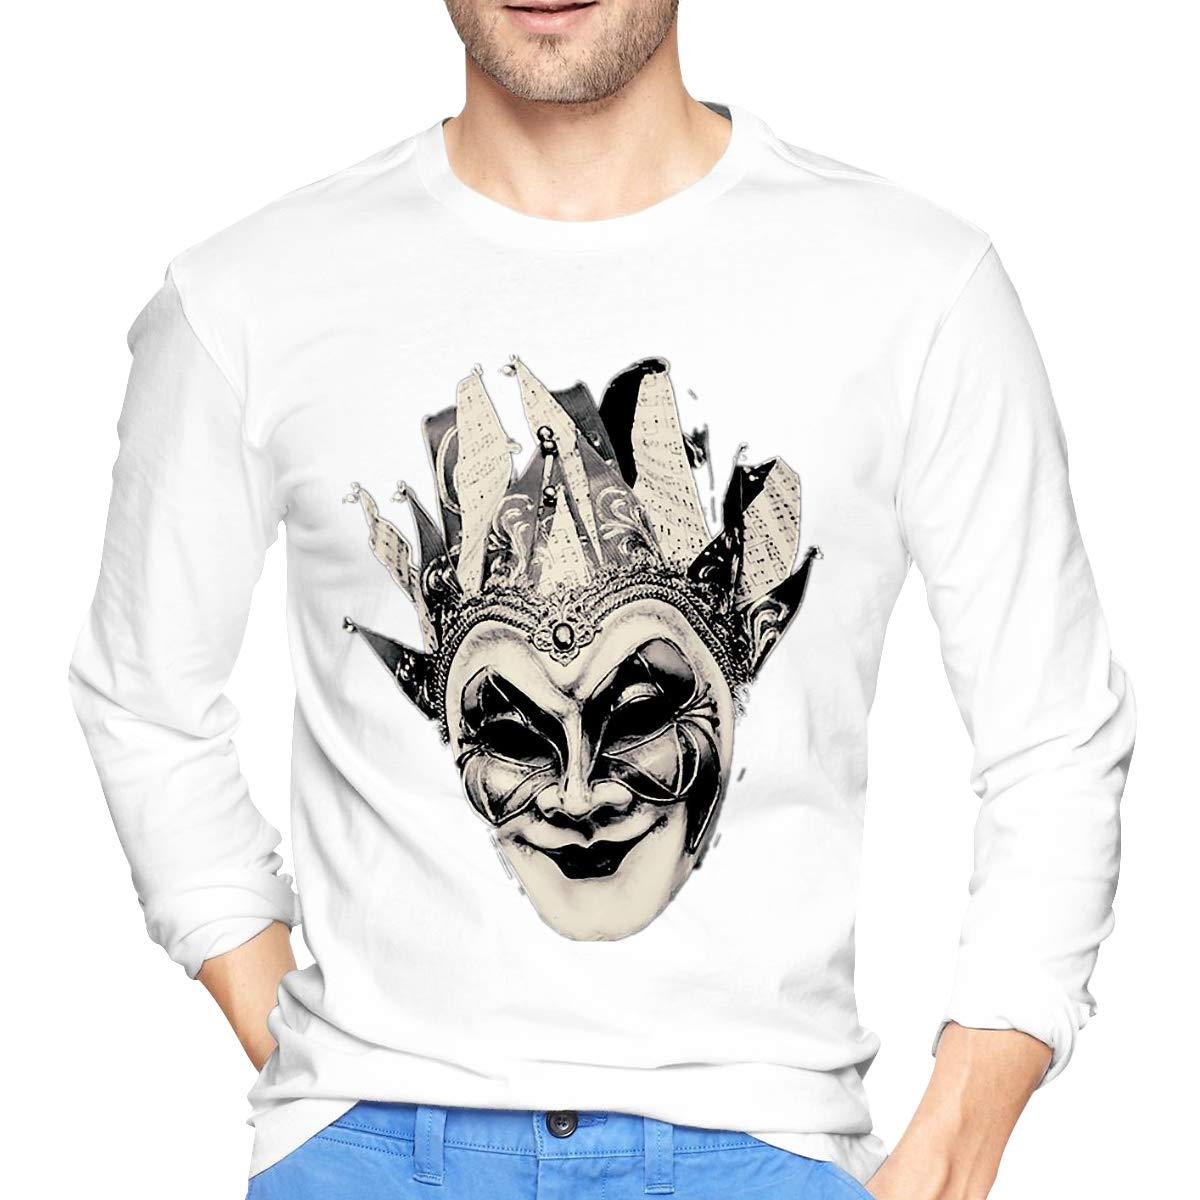 Lihehen S Boris Brejcha Round Neck Tees Shirts